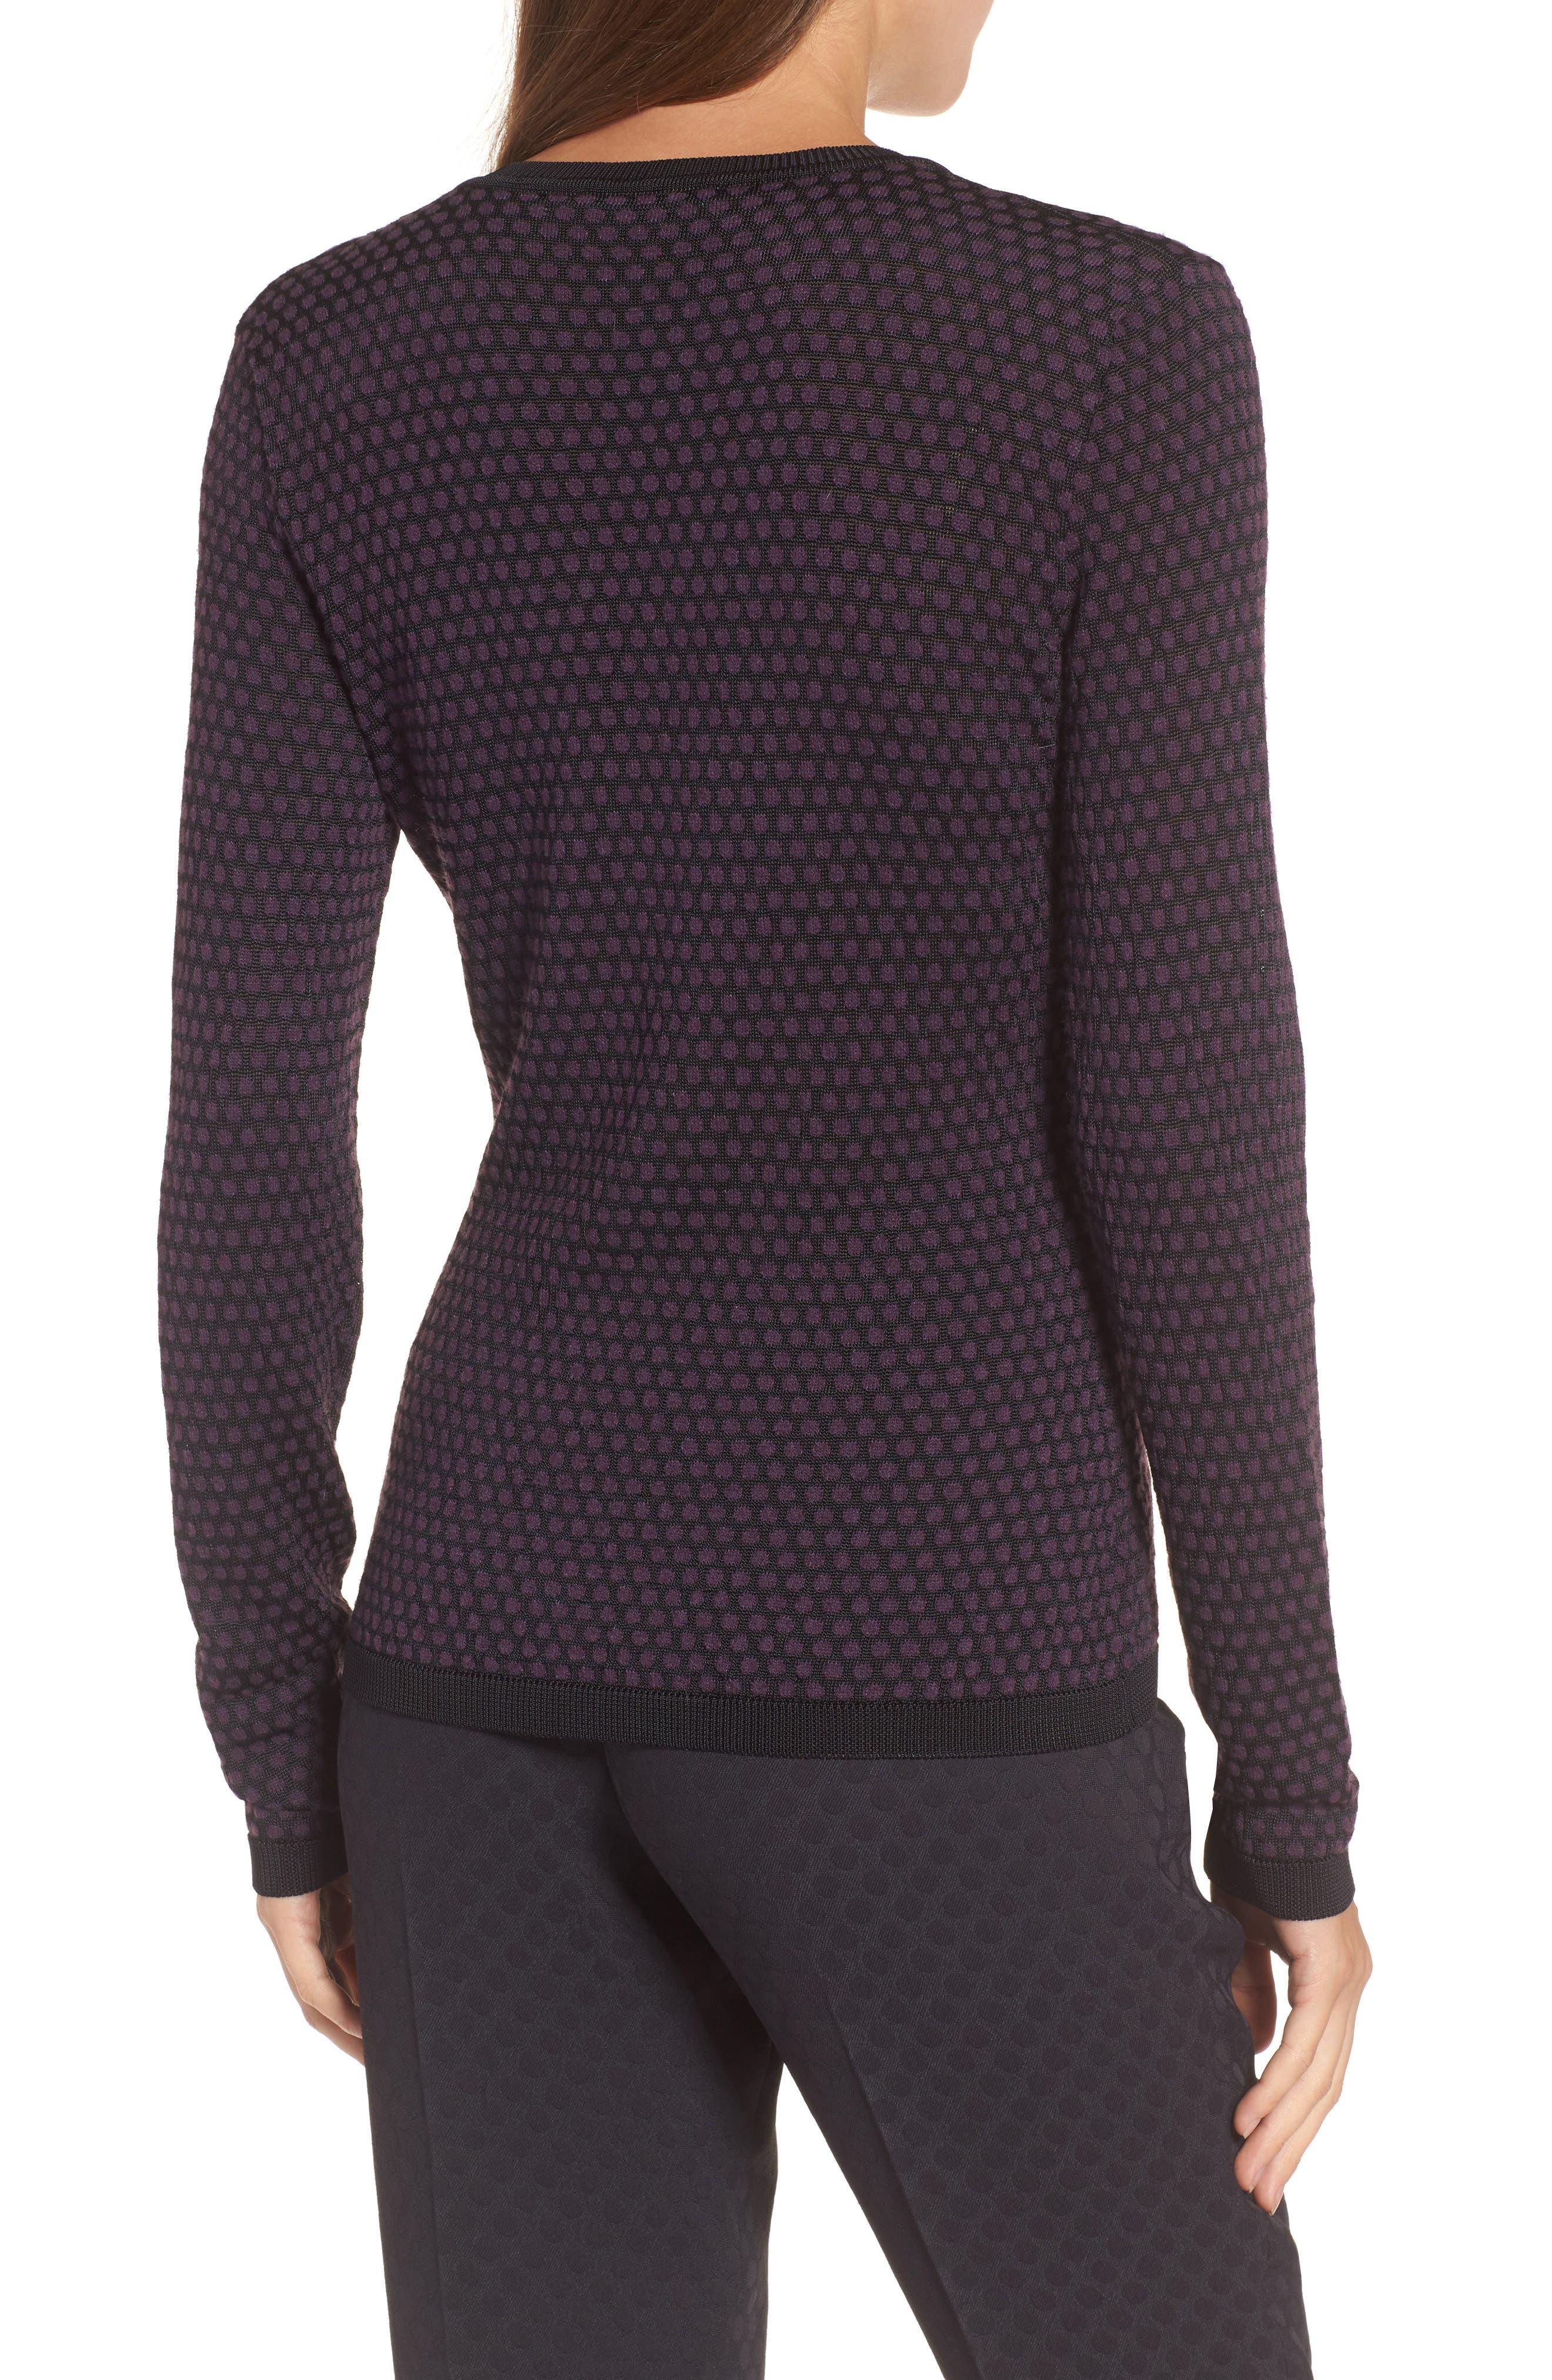 Dot Fielitza Jacquard Sweater,                             Alternate thumbnail 2, color,                             Dark Dahlia